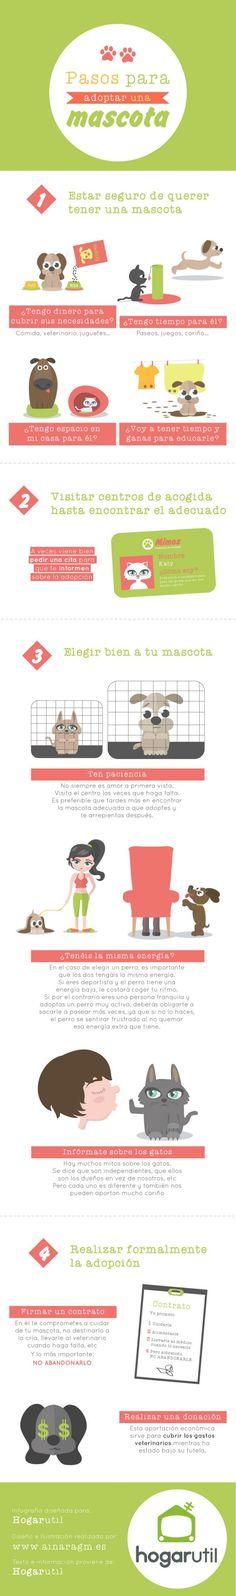 infografía de pasos para adoptar a una mascota. Conoce los pasos a seguir si estás pensando en adoptar un animal. #adopcion #mascotas